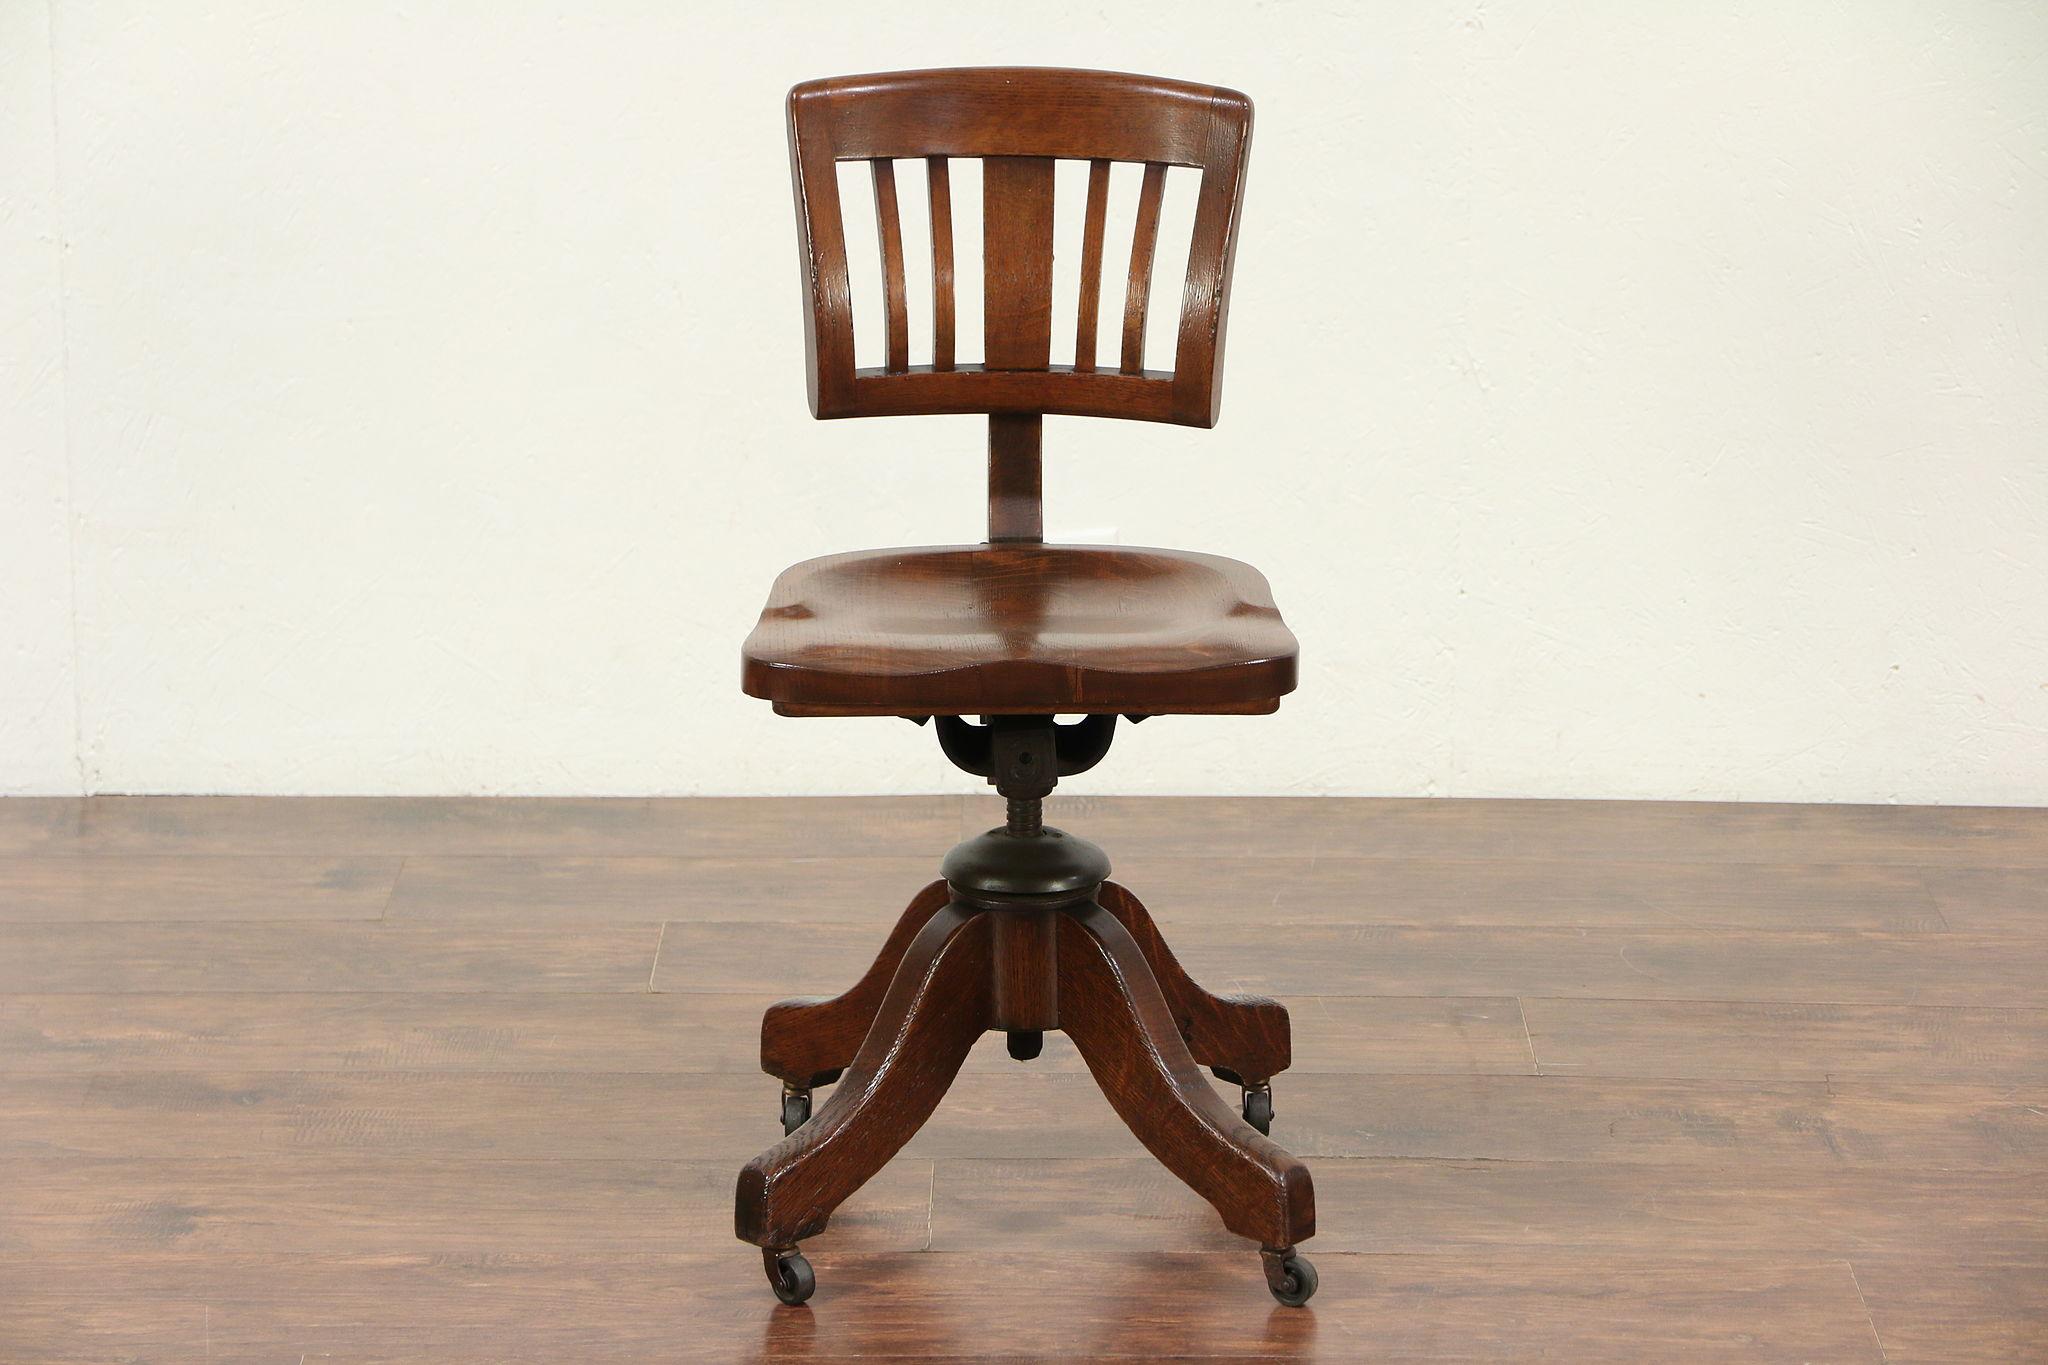 Sold Oak Antique 1930 S Vintage Adjustable Swivel Small Desk Chair Johnson 29439 Harp Gallery Antiques Furniture